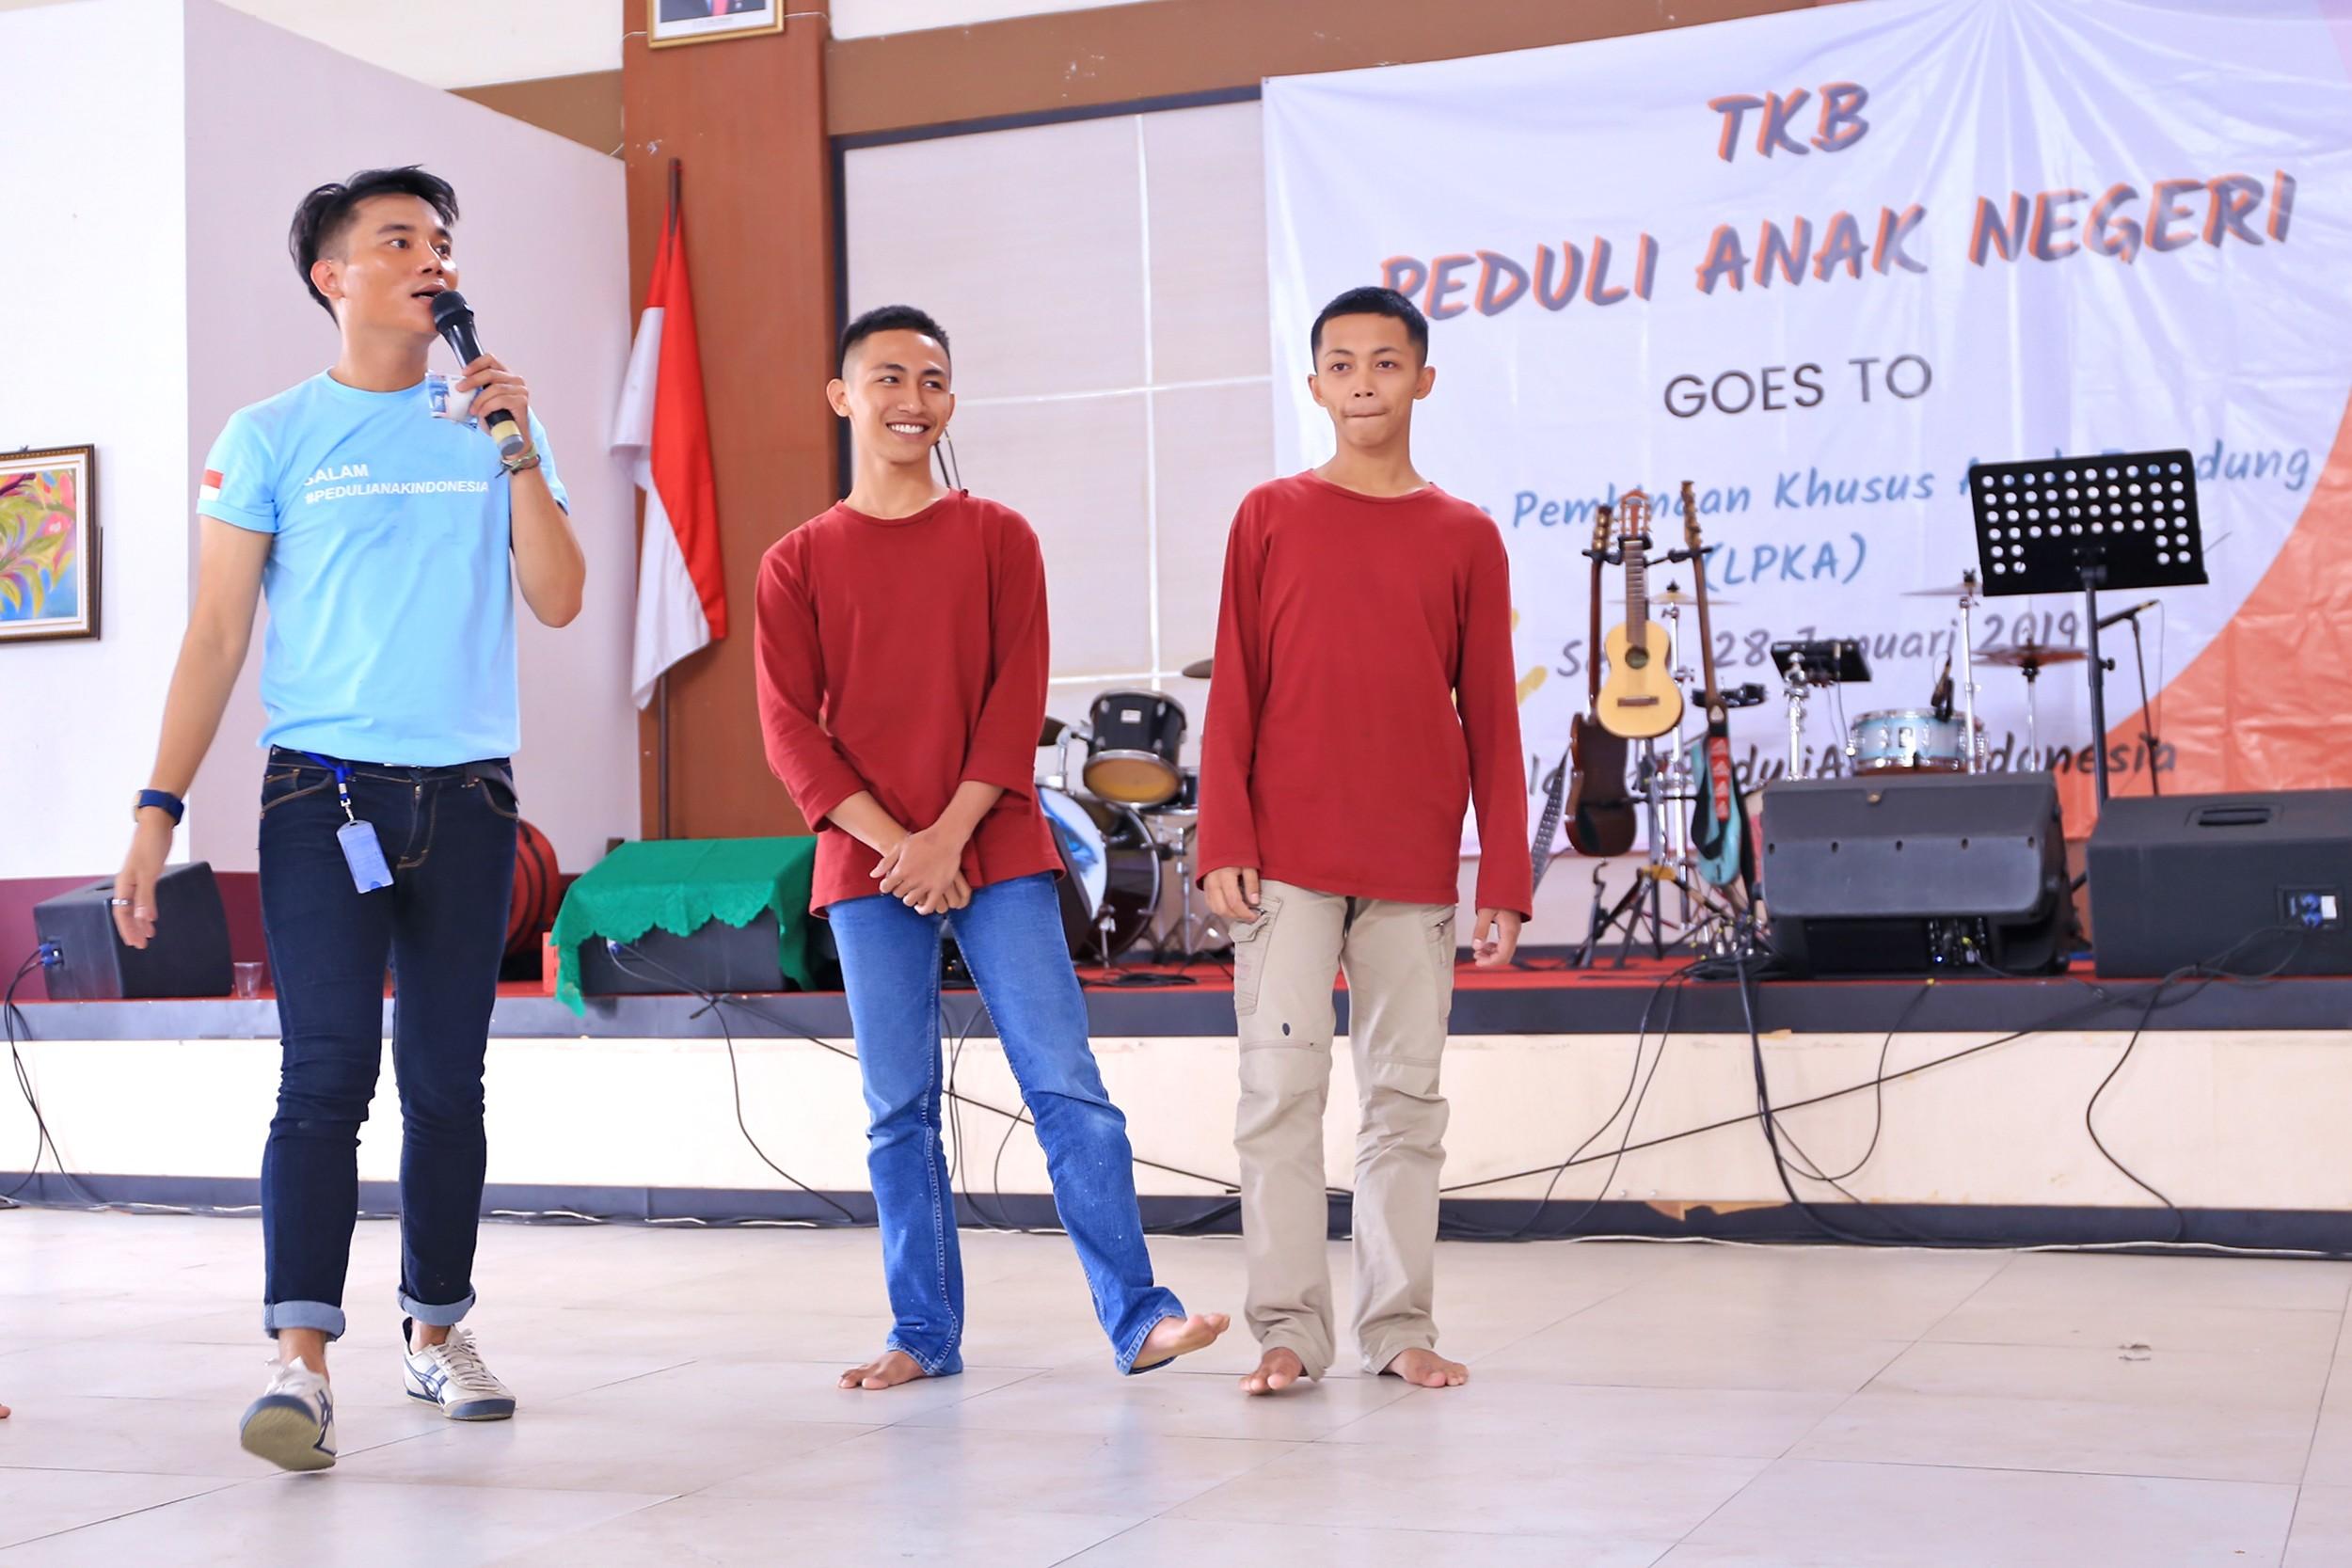 Kunjungan relawan Yayasan Trikusuma Bangsa di Lembaga Pembinaan Khusus Anak (LPKA) Sukamiskin di Bandung, Jawa Barat, 28 Januari  2019 - nalar.id